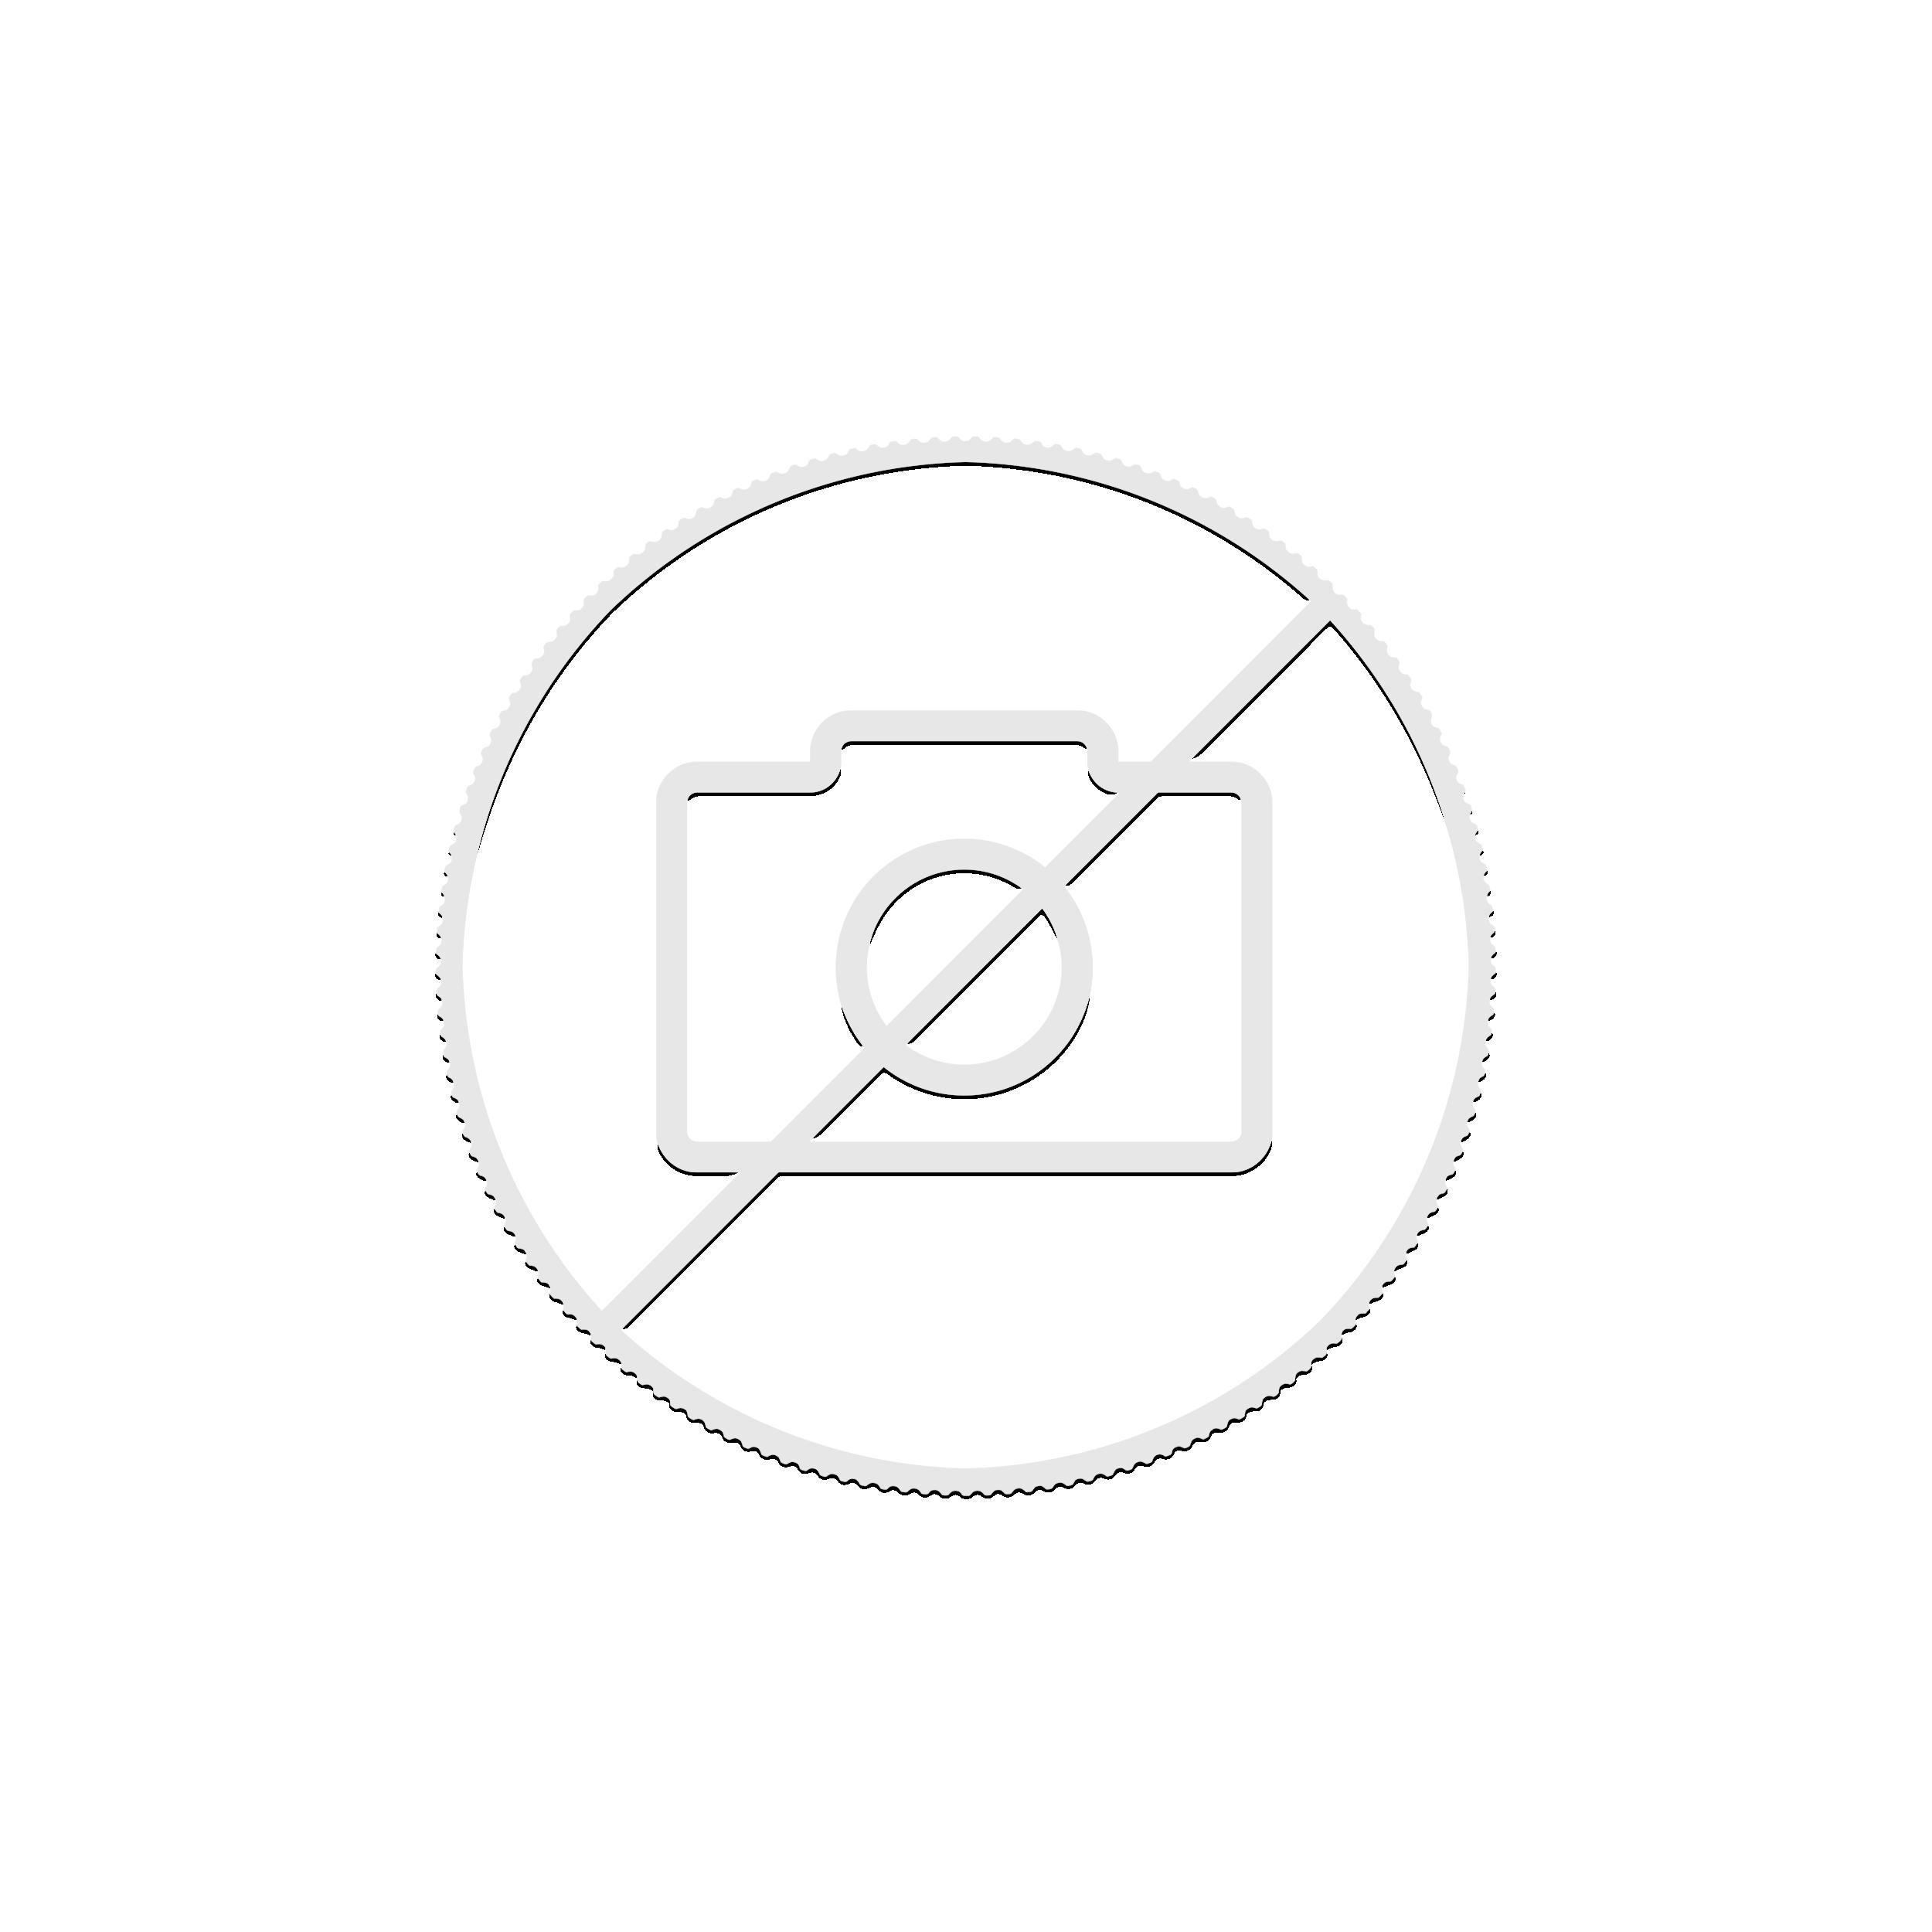 1 troy ounce zilveren munt Disney fantasia 80-jarig jubileum 2021